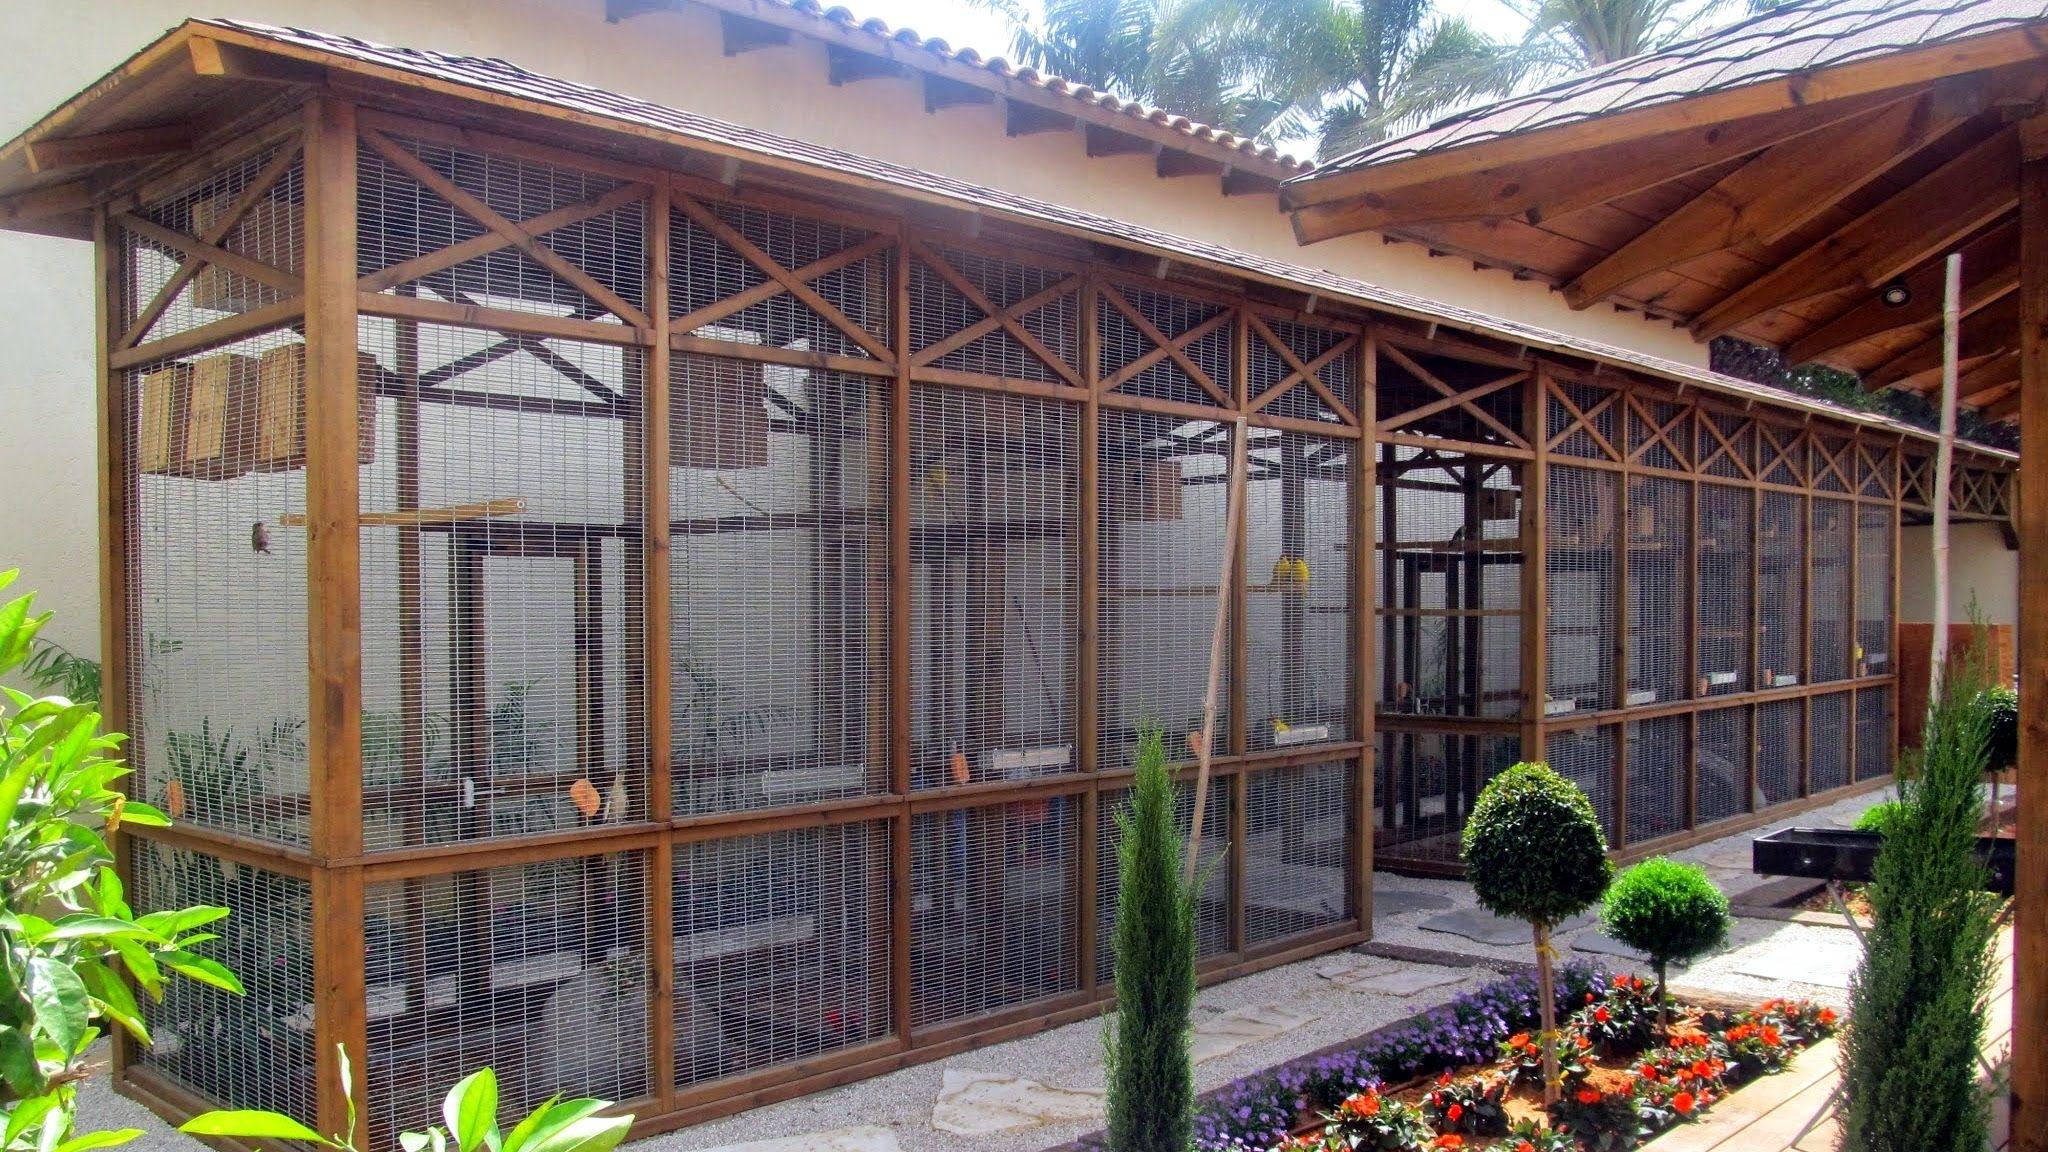 Garden aviary construction stages | Aviaries | Pinterest | Bird ...